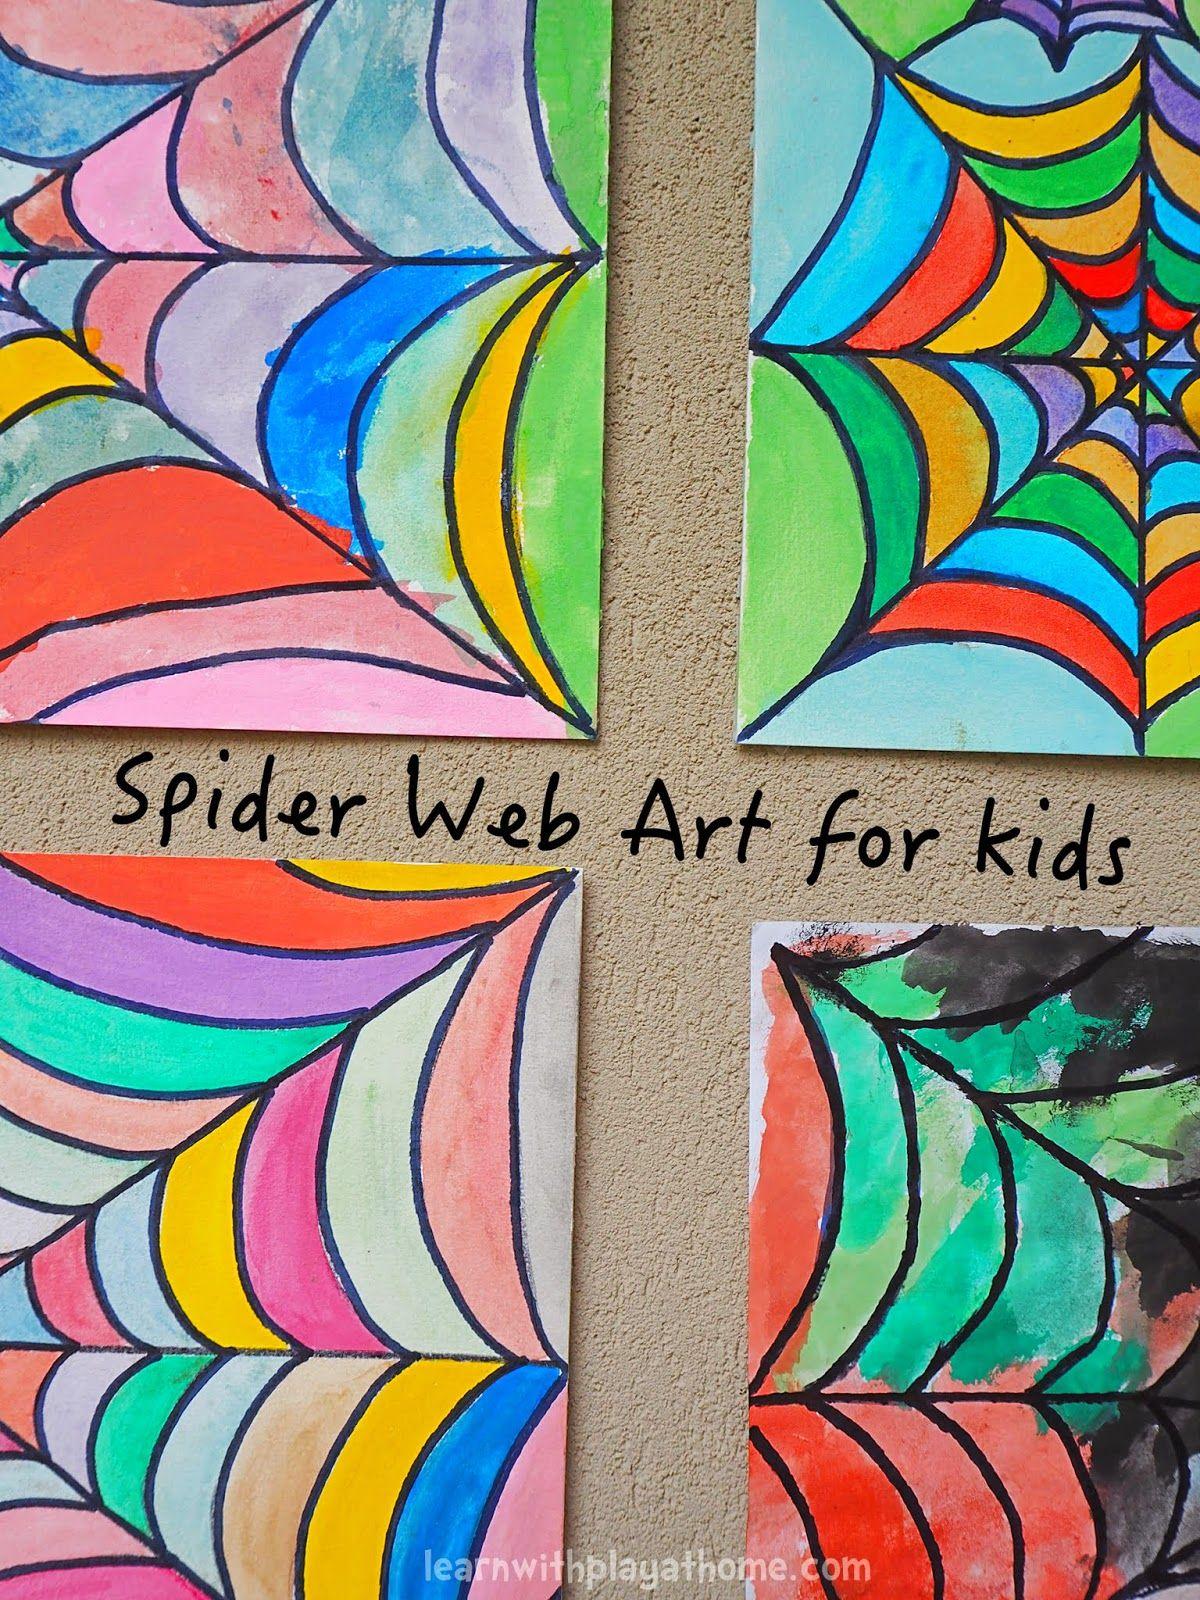 Spider Web Art for Kids | Aula de arte, Actividades y Actividades ...